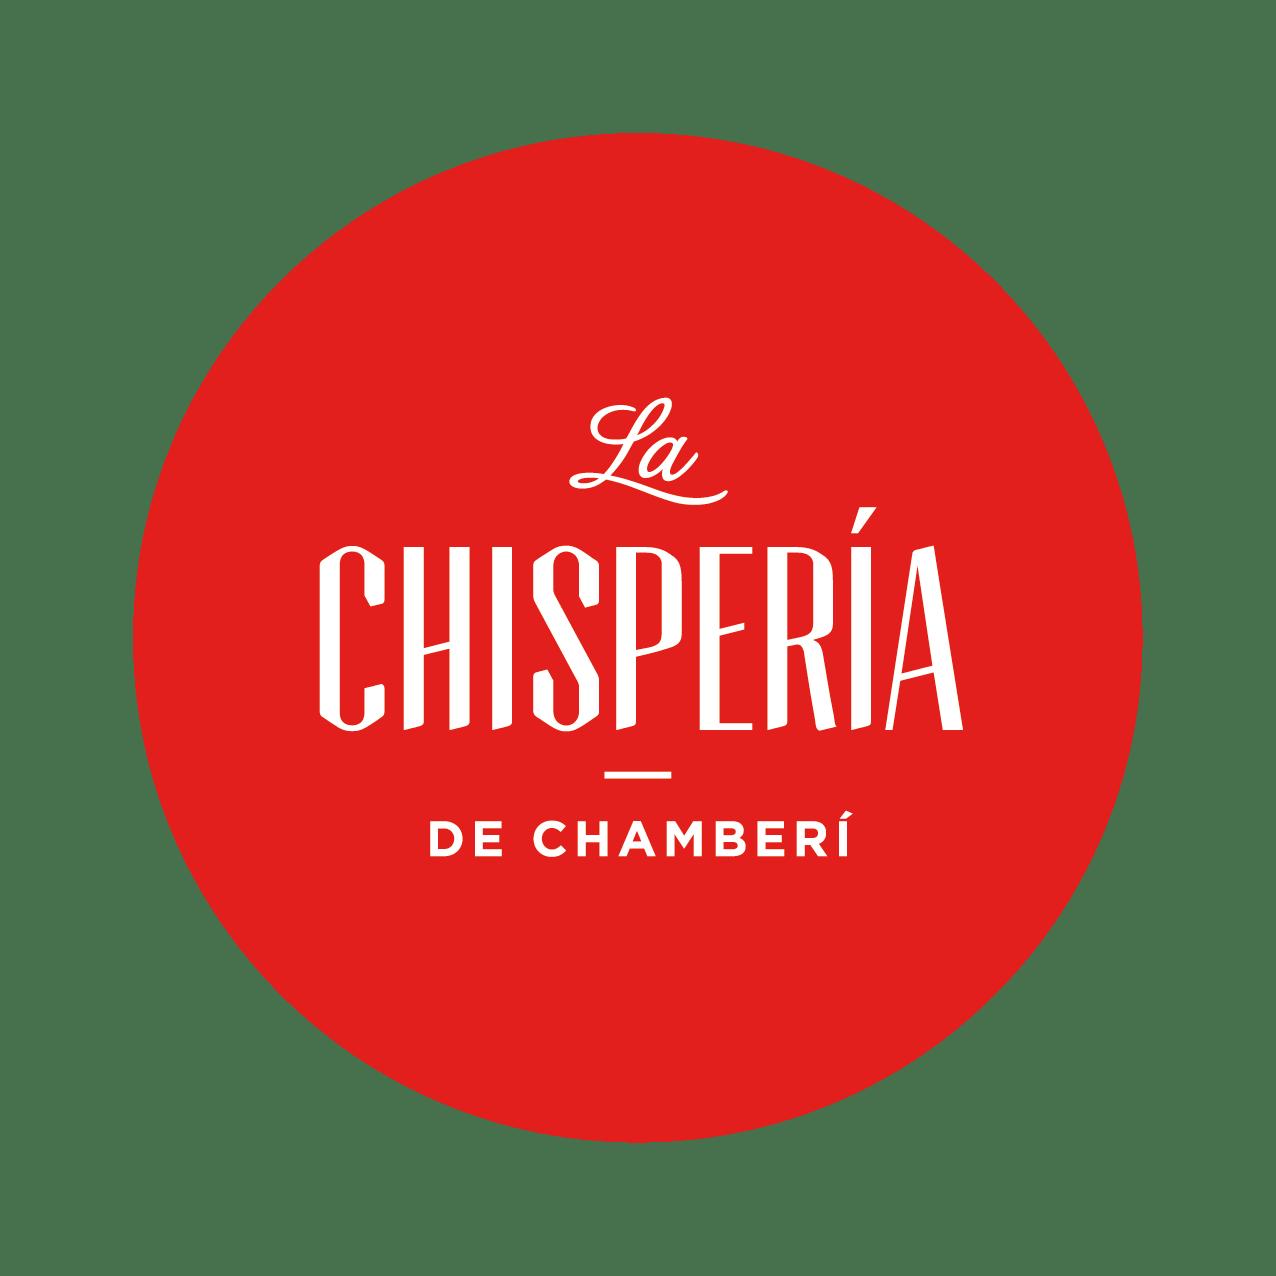 La Chispería de Chamberí